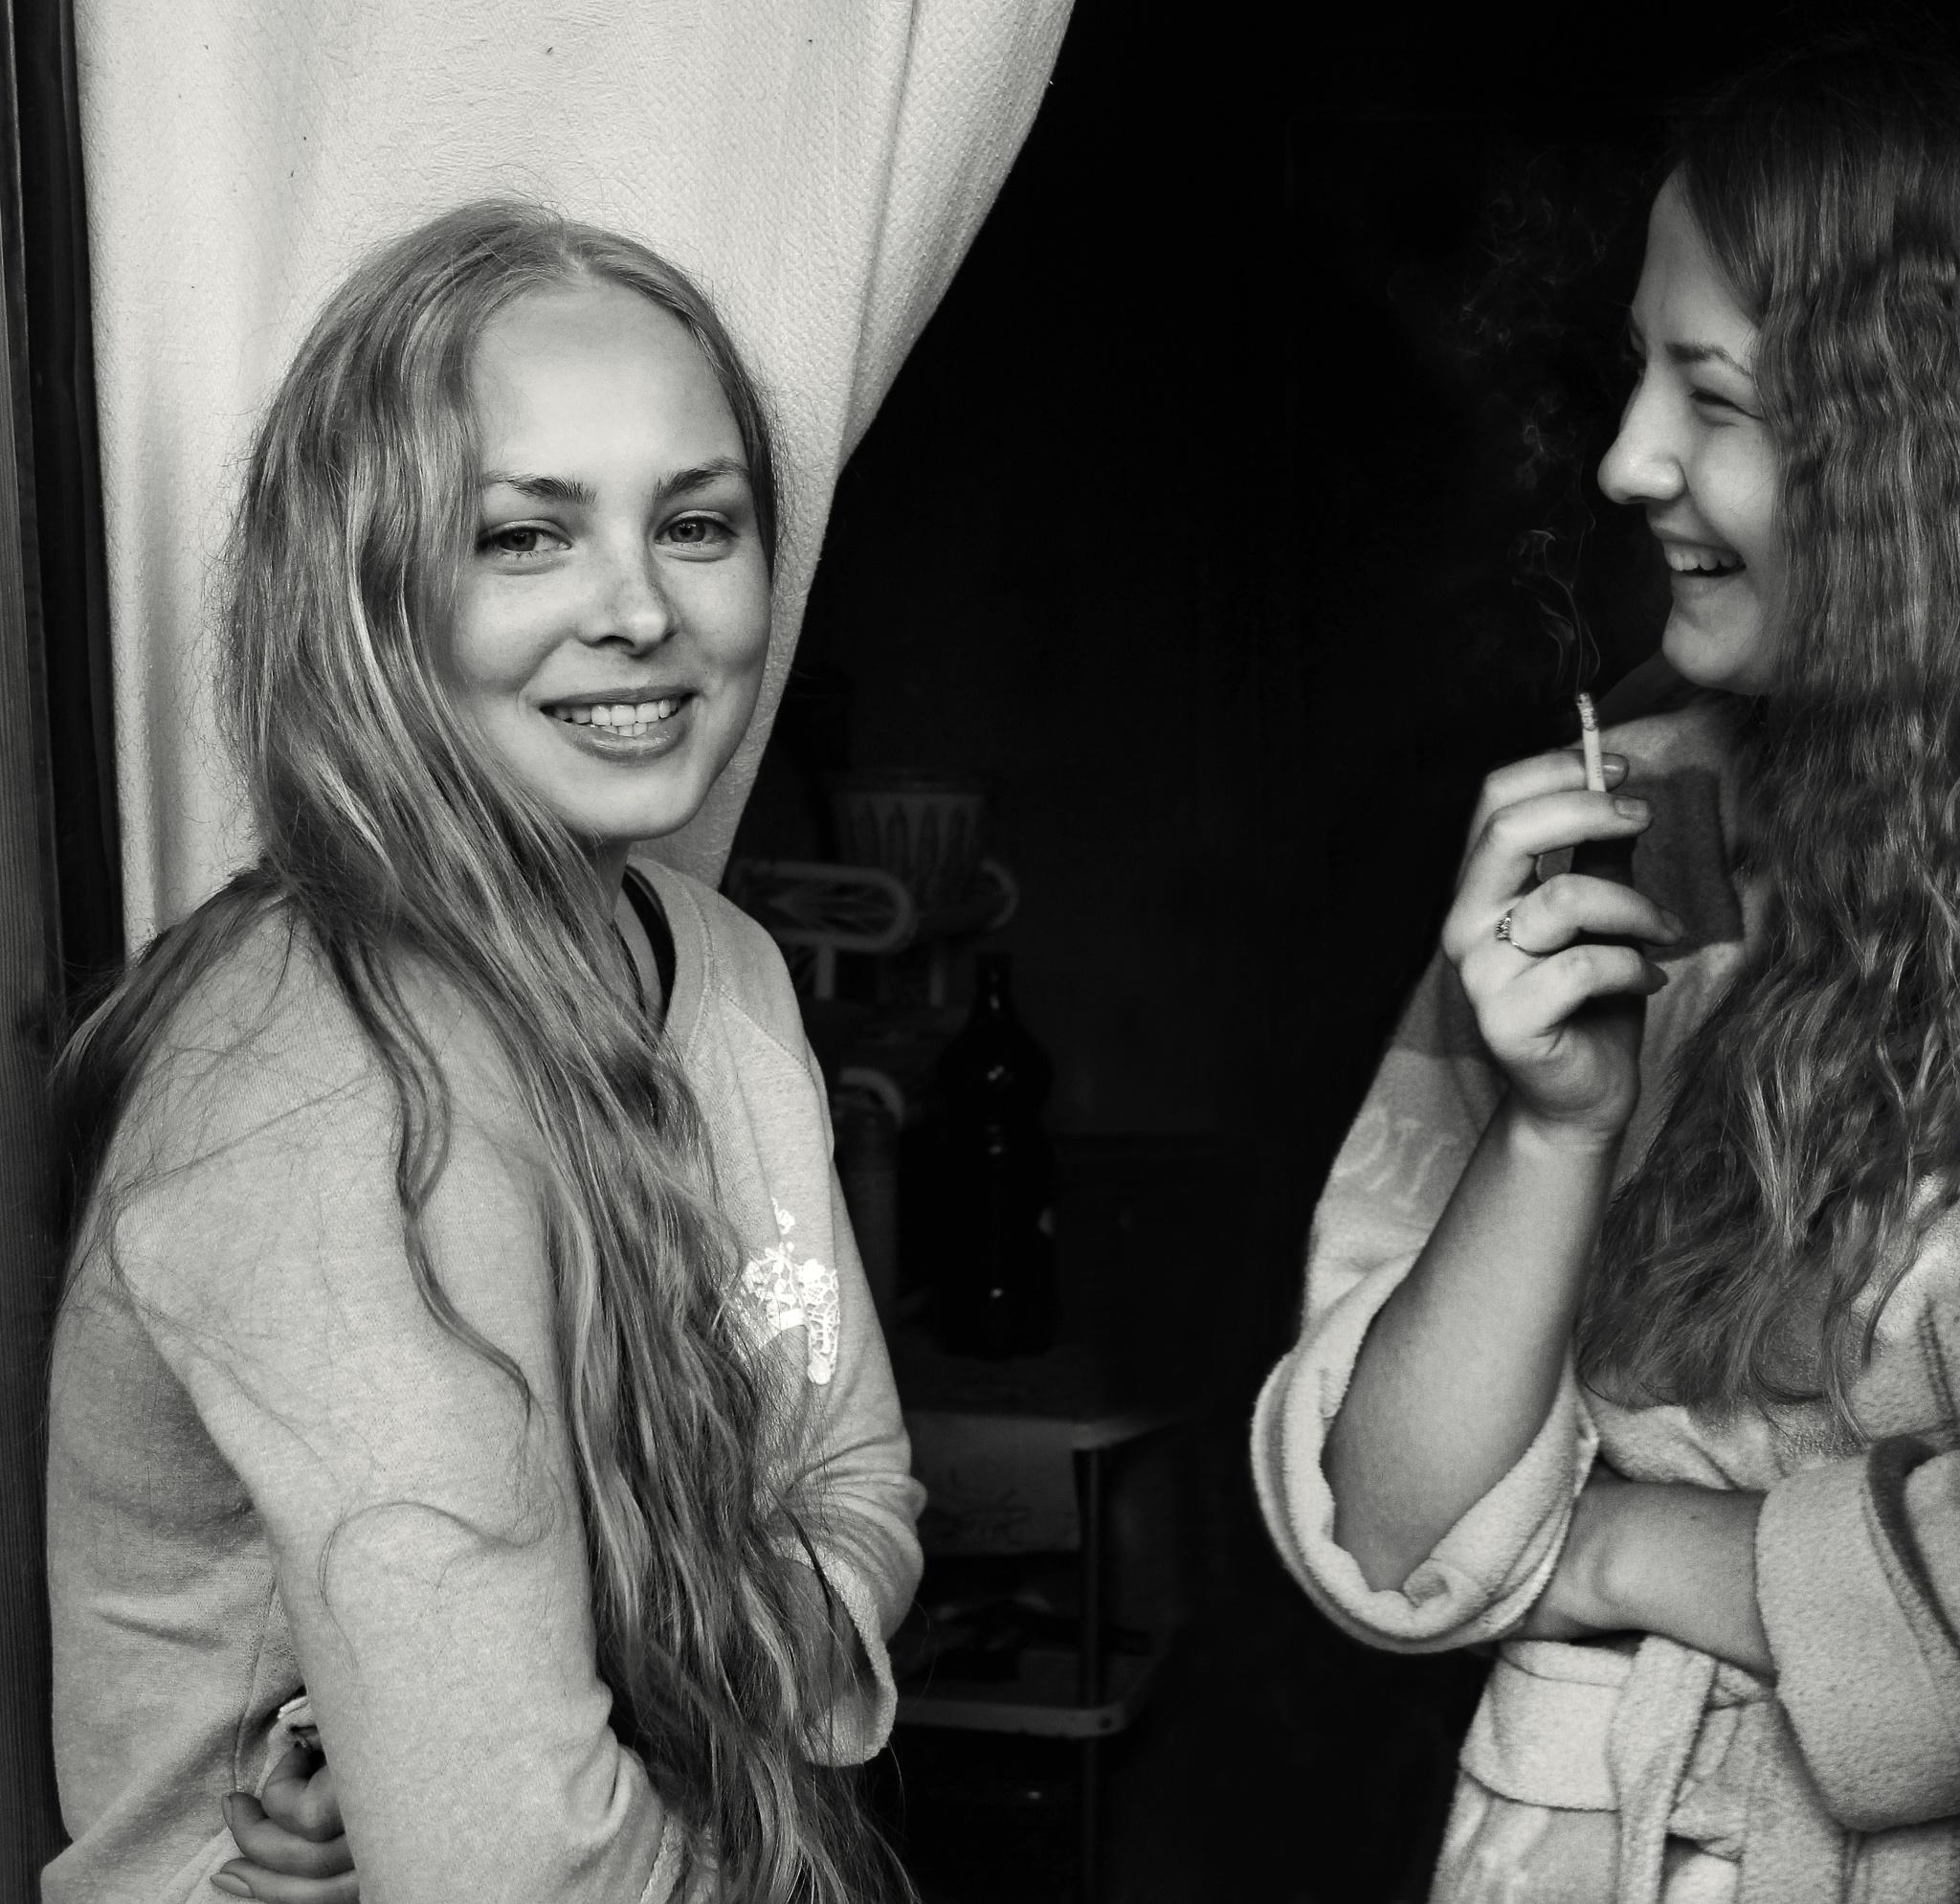 Masha and Lisa by Сергей Юрьев